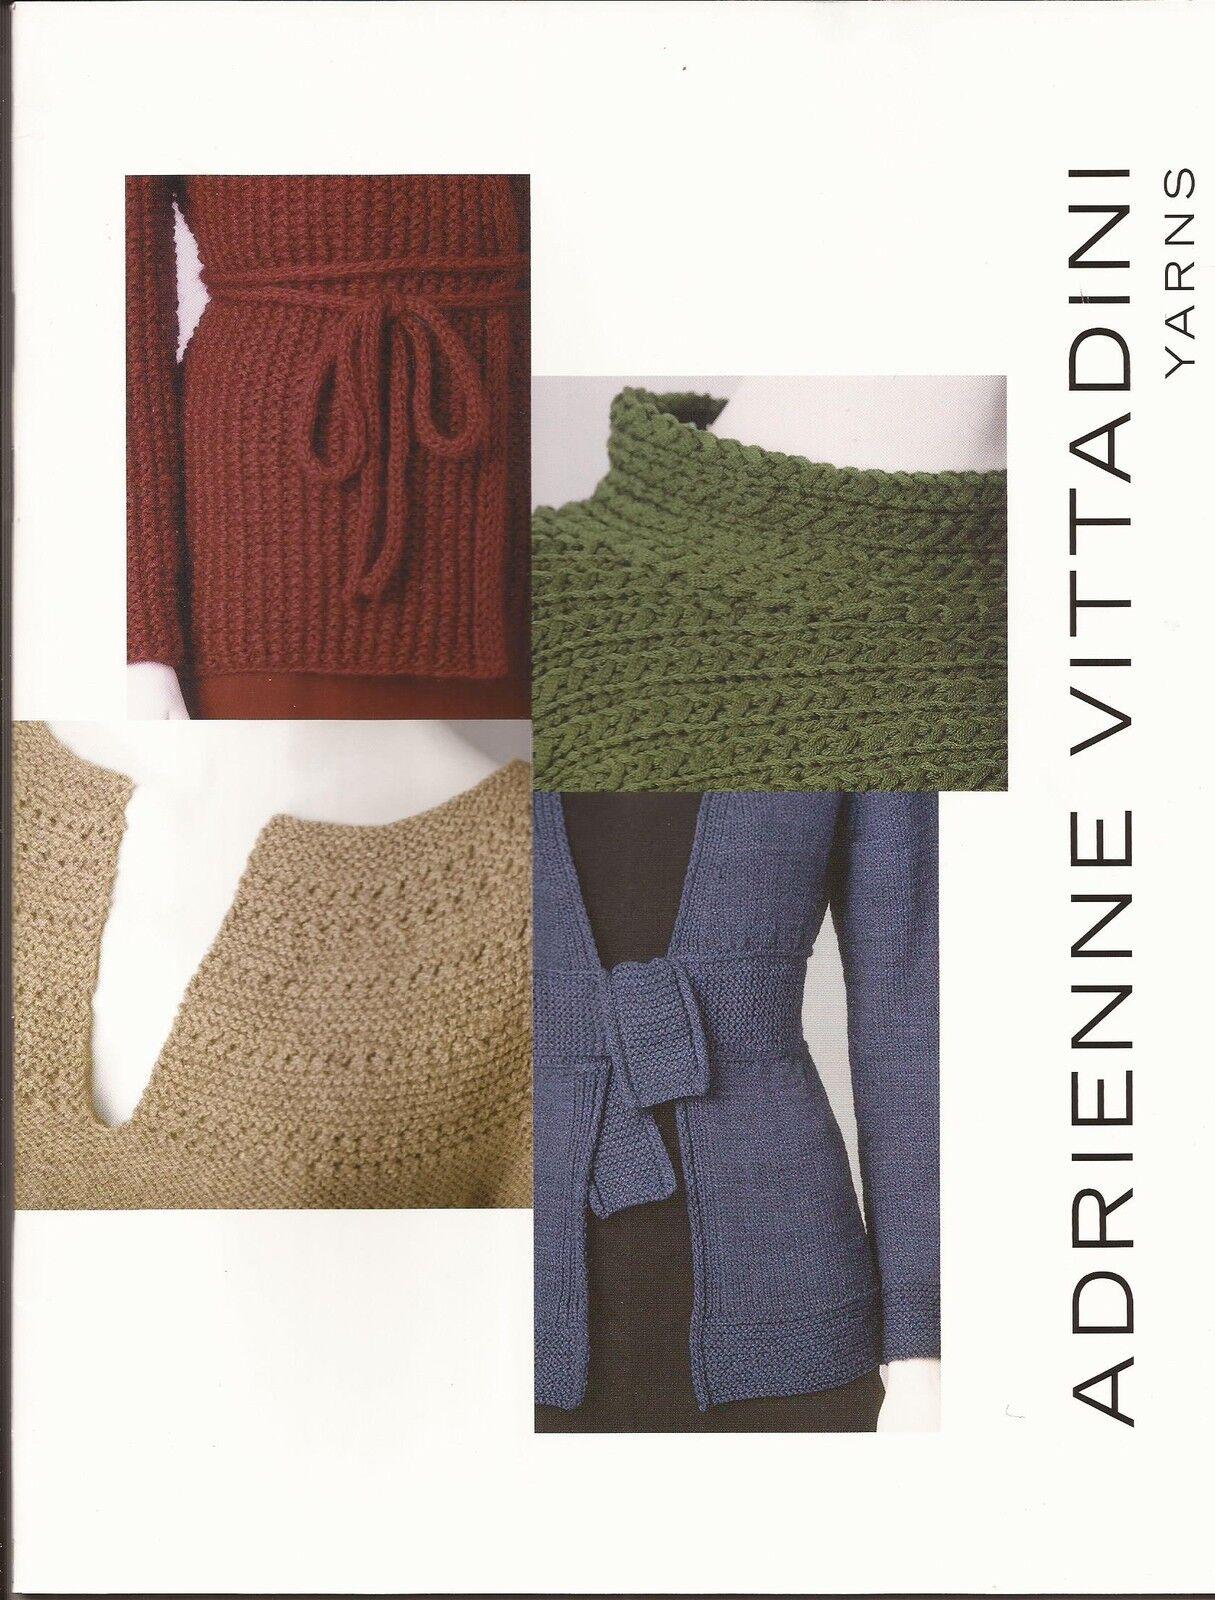 Adrienne Vittadini Knitting Pattern Book Vol 17 Women\'s Designs | eBay